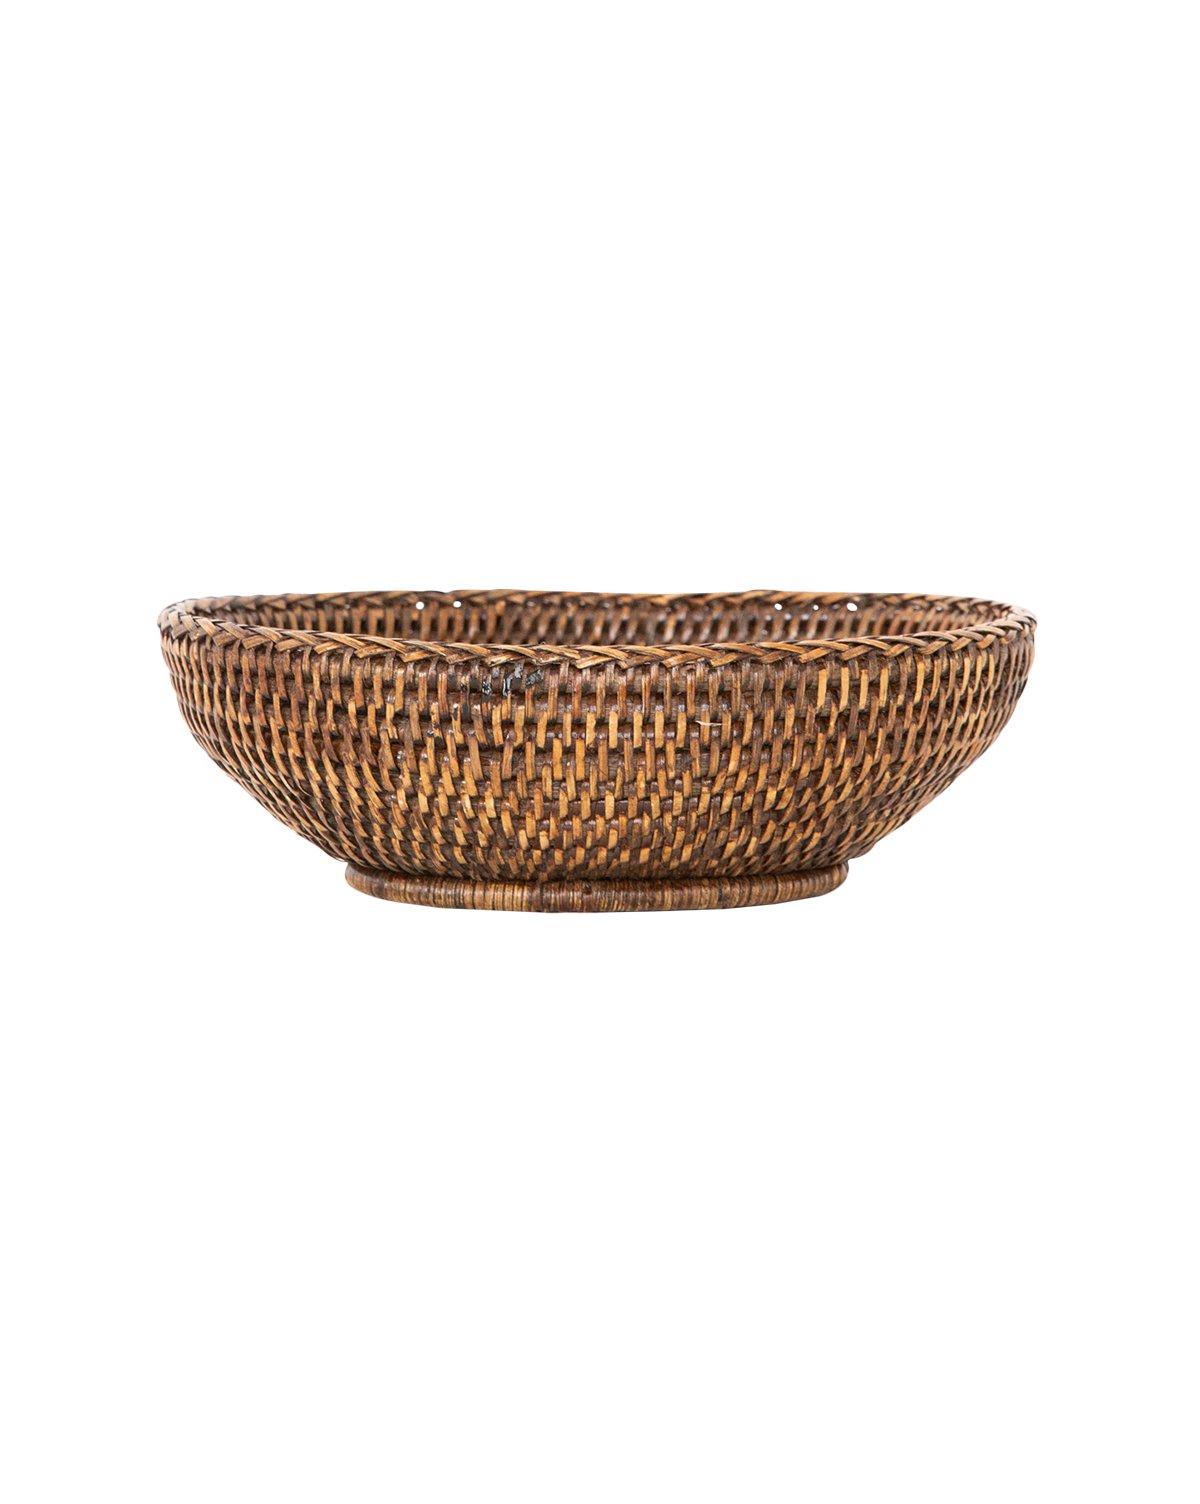 dark_rattan_oval_bowl2.jpg